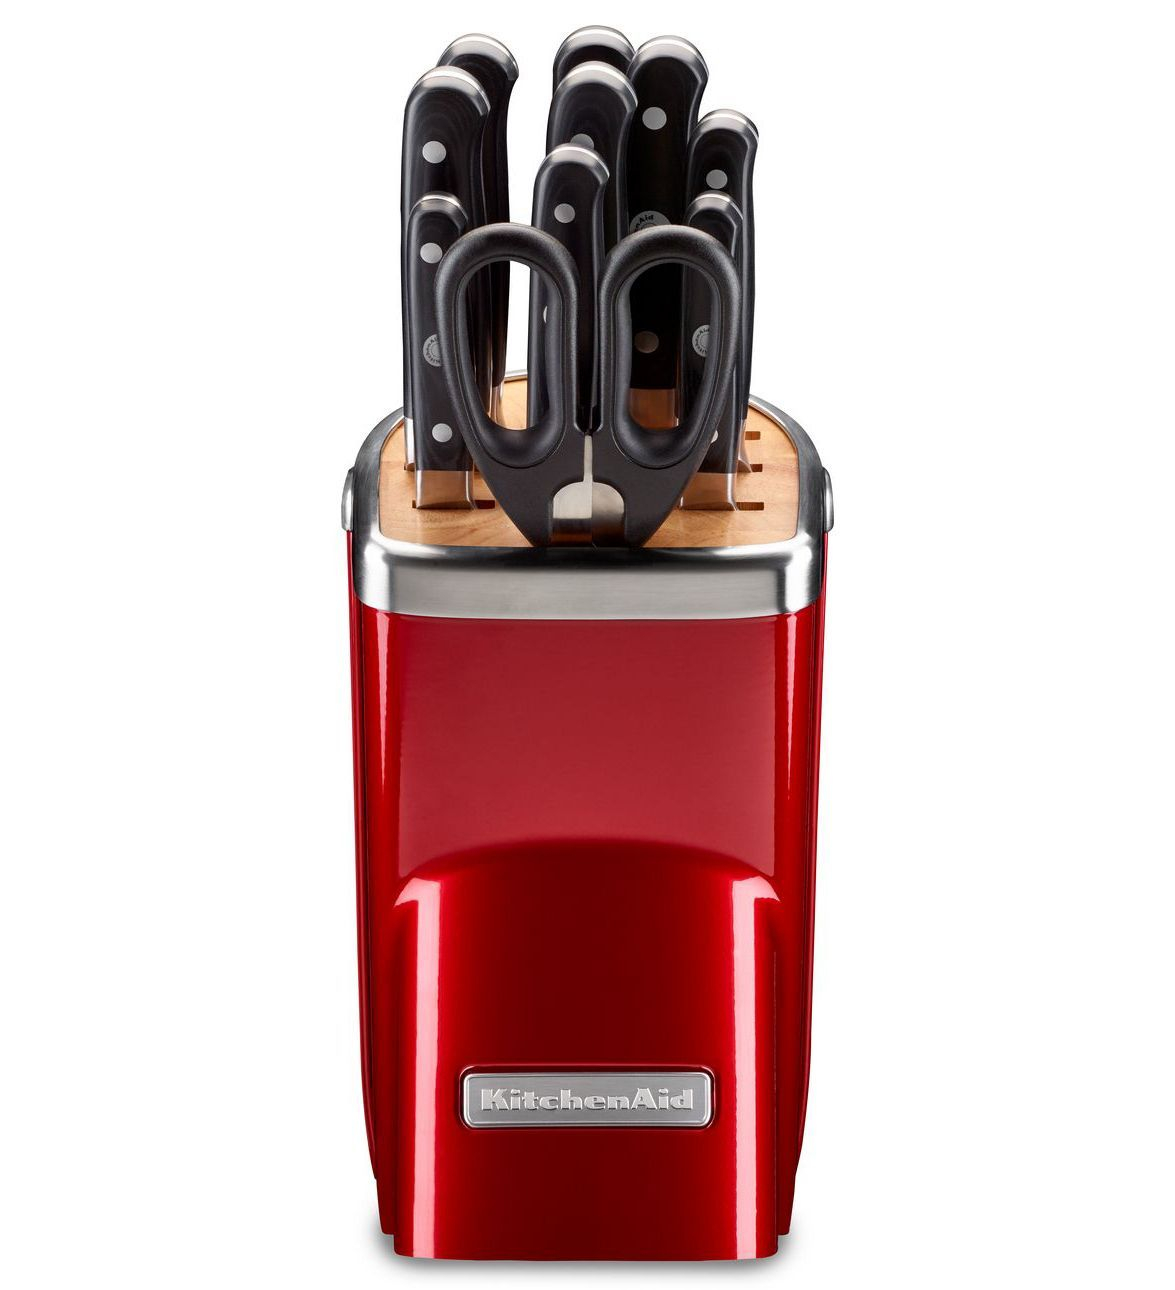 KitchenAid® 11pc Professional Series Cutlery Set | Fish Tacos ... on gladiator knife set, star wars knife set, creek stewart knife set, wolfgang puck knife set, joyce chen knife set, norpro knife set, robert welch knife set, as seen on tv knife set, kitchen a la carte knife set, knork knife set, magic chef knife set, imperial knife set, tools of the trade knife set, tefal knife set, progressive knife set, x wing knife set, silvermark knife set, farberware knife set, high quality kitchen knife set, cook's essentials knife set,